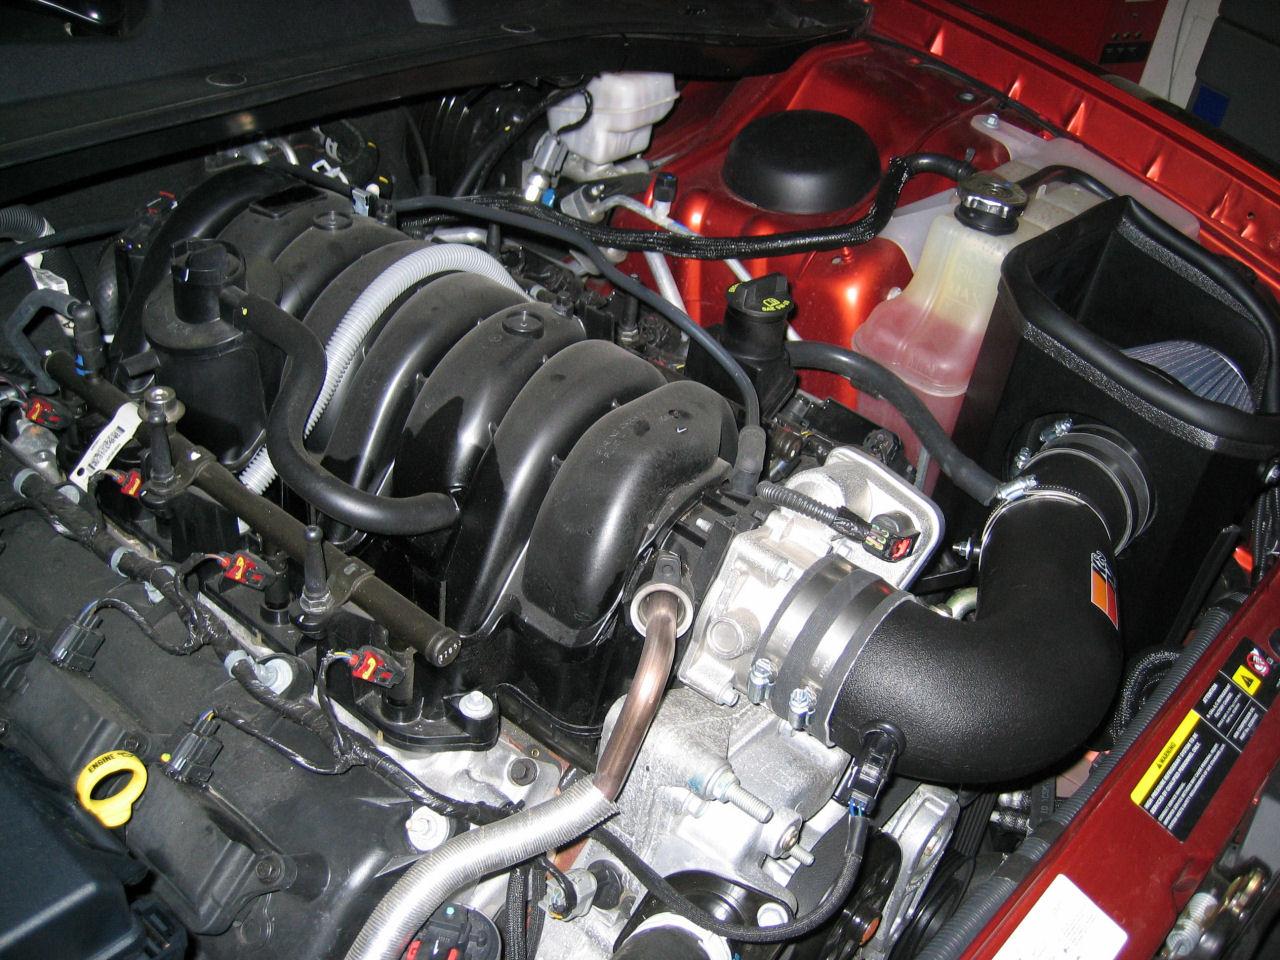 2006 Dodge Charger R/T Daytona: kit aspirazione diretta K/N